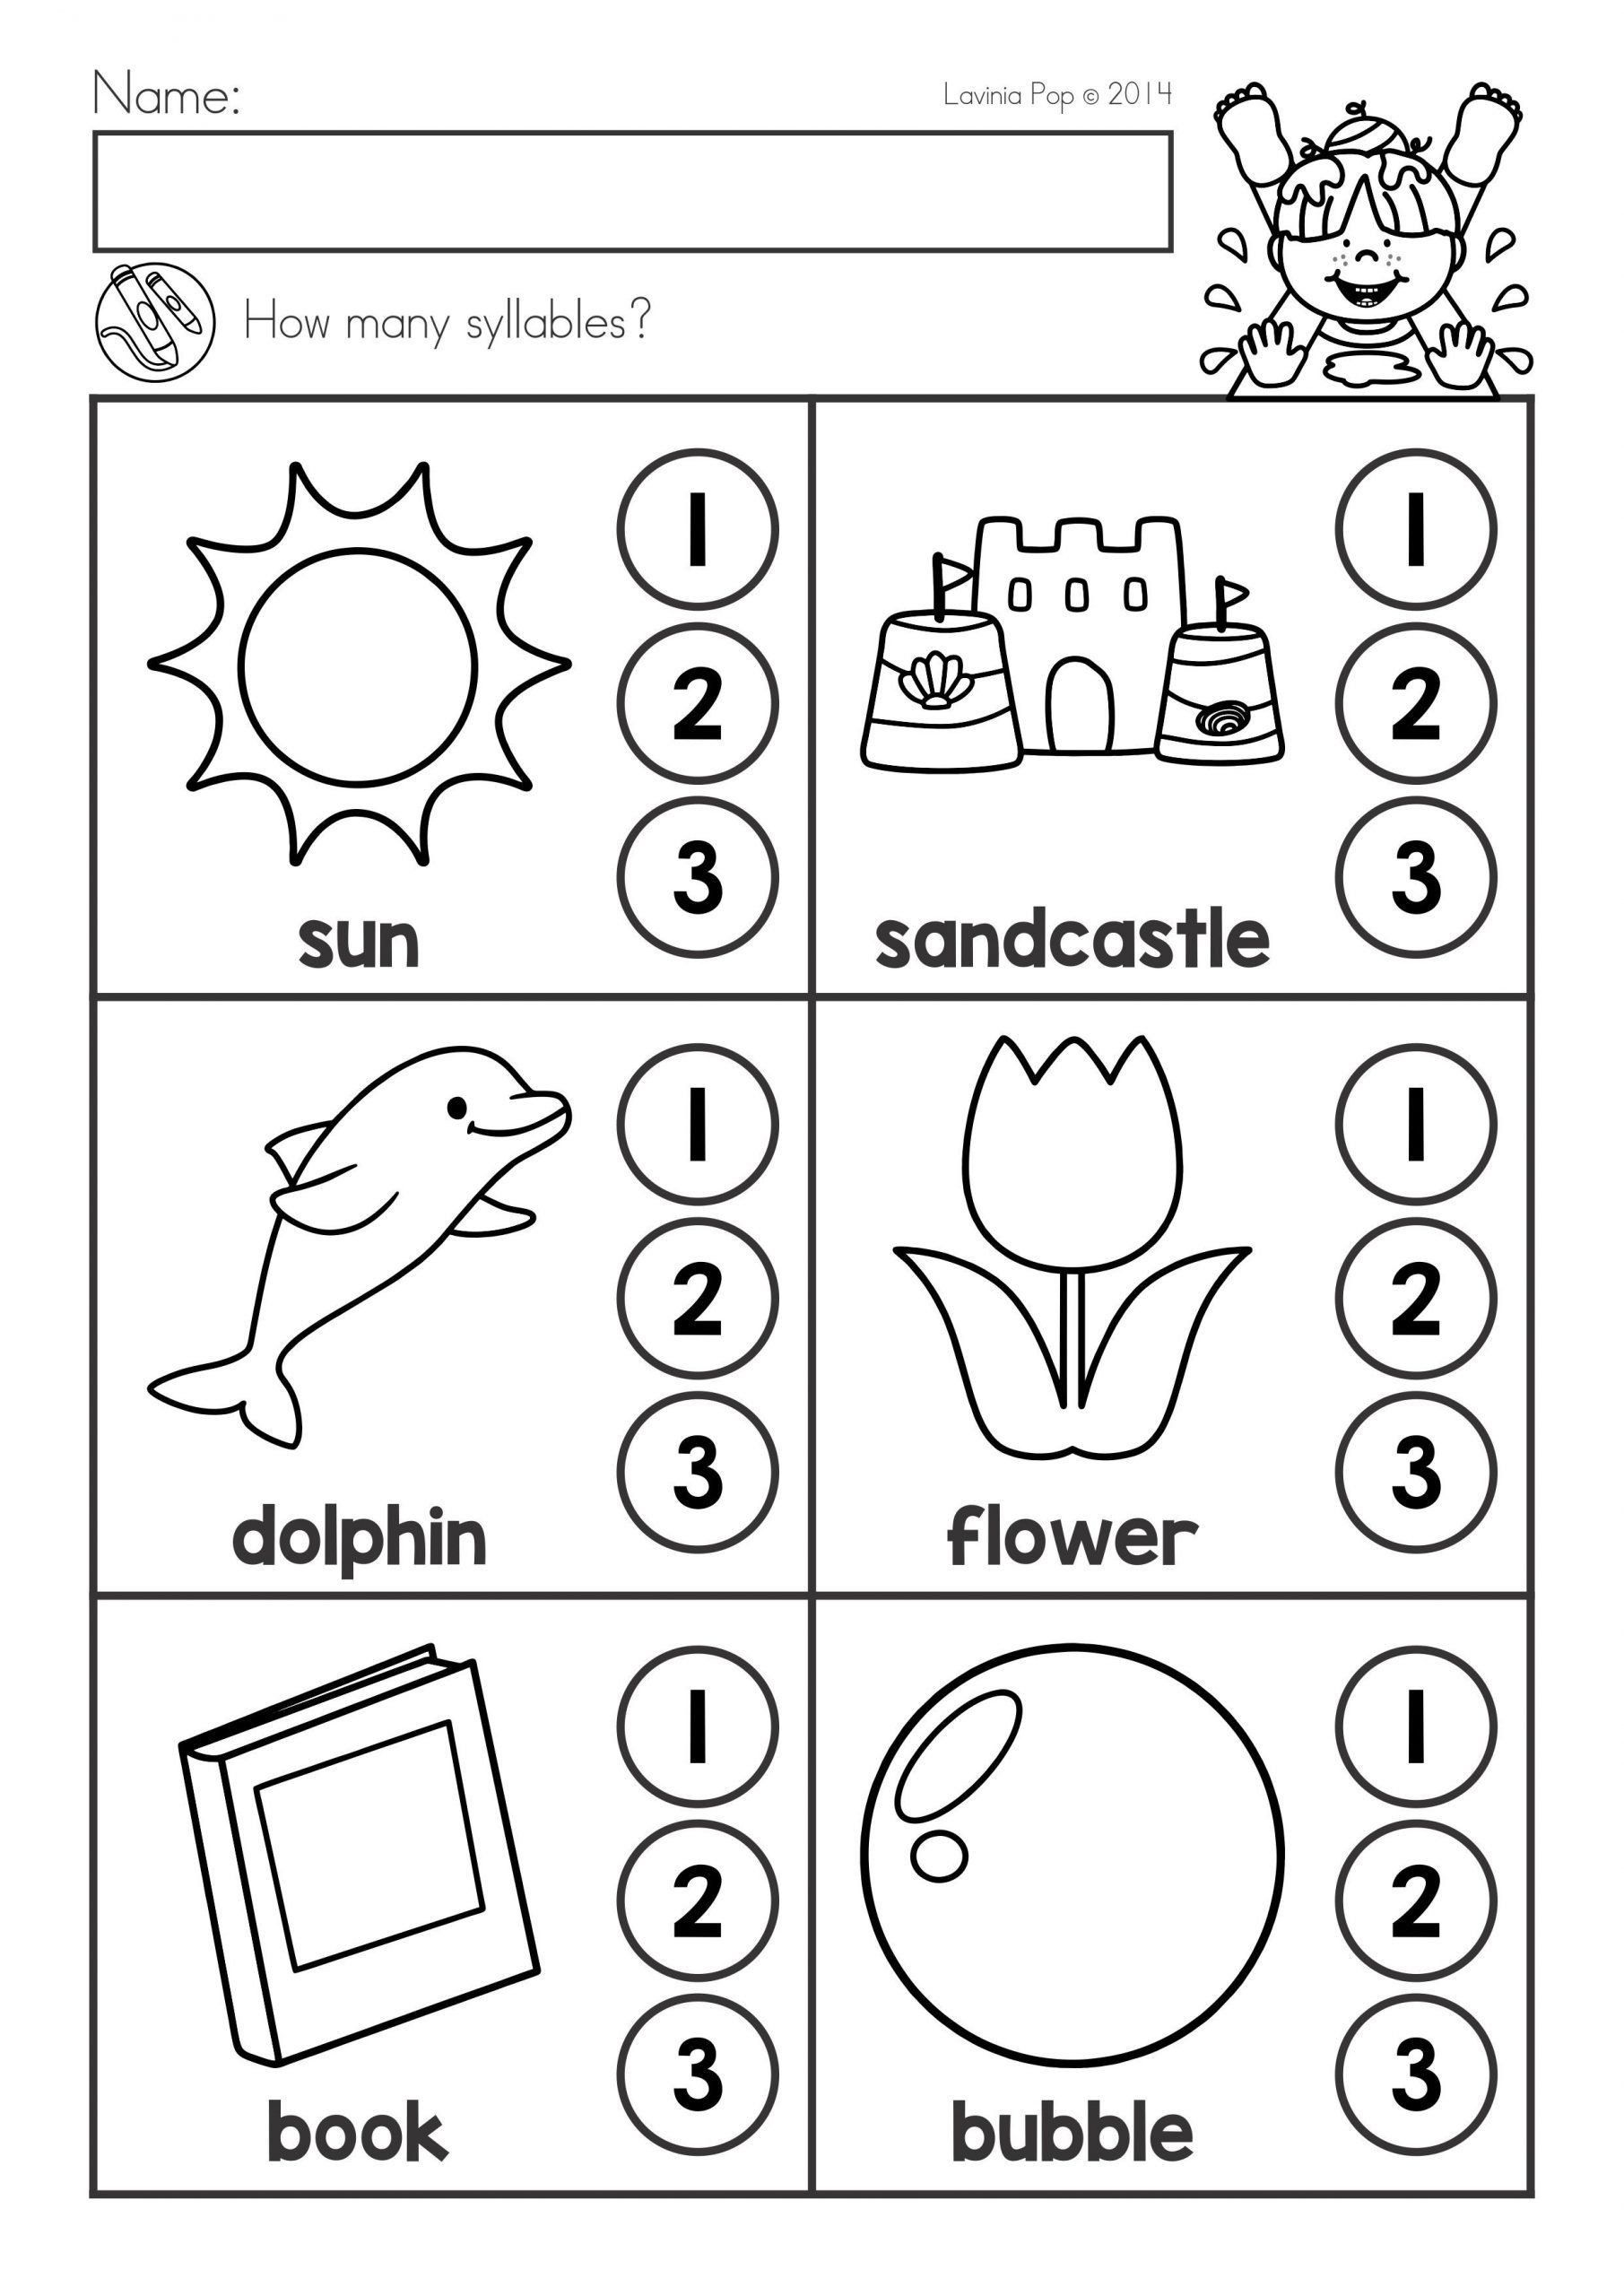 Syllables Worksheet For Kindergarten In